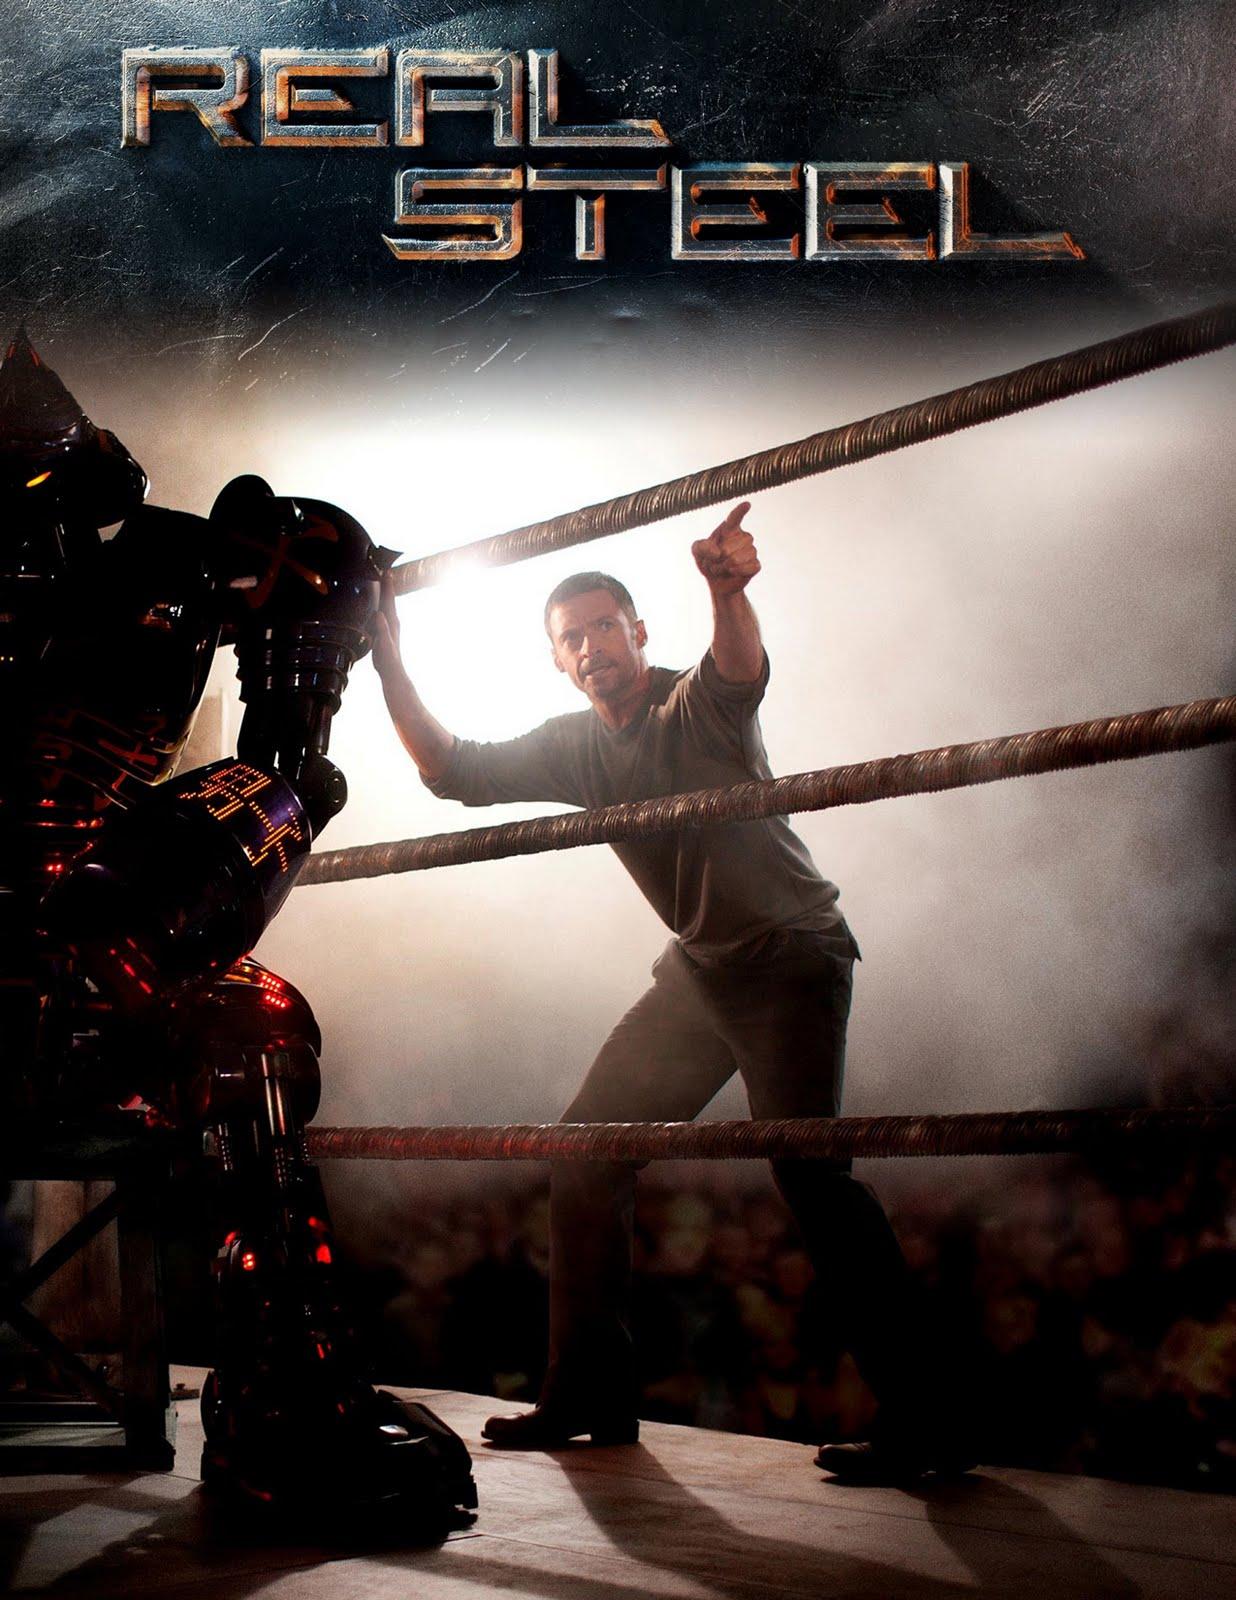 http://3.bp.blogspot.com/-WJUbN1-7jRI/TWU6MY6K6CI/AAAAAAAAlr8/HuUqGvHrv8k/s1600/Real-Steel.jpg